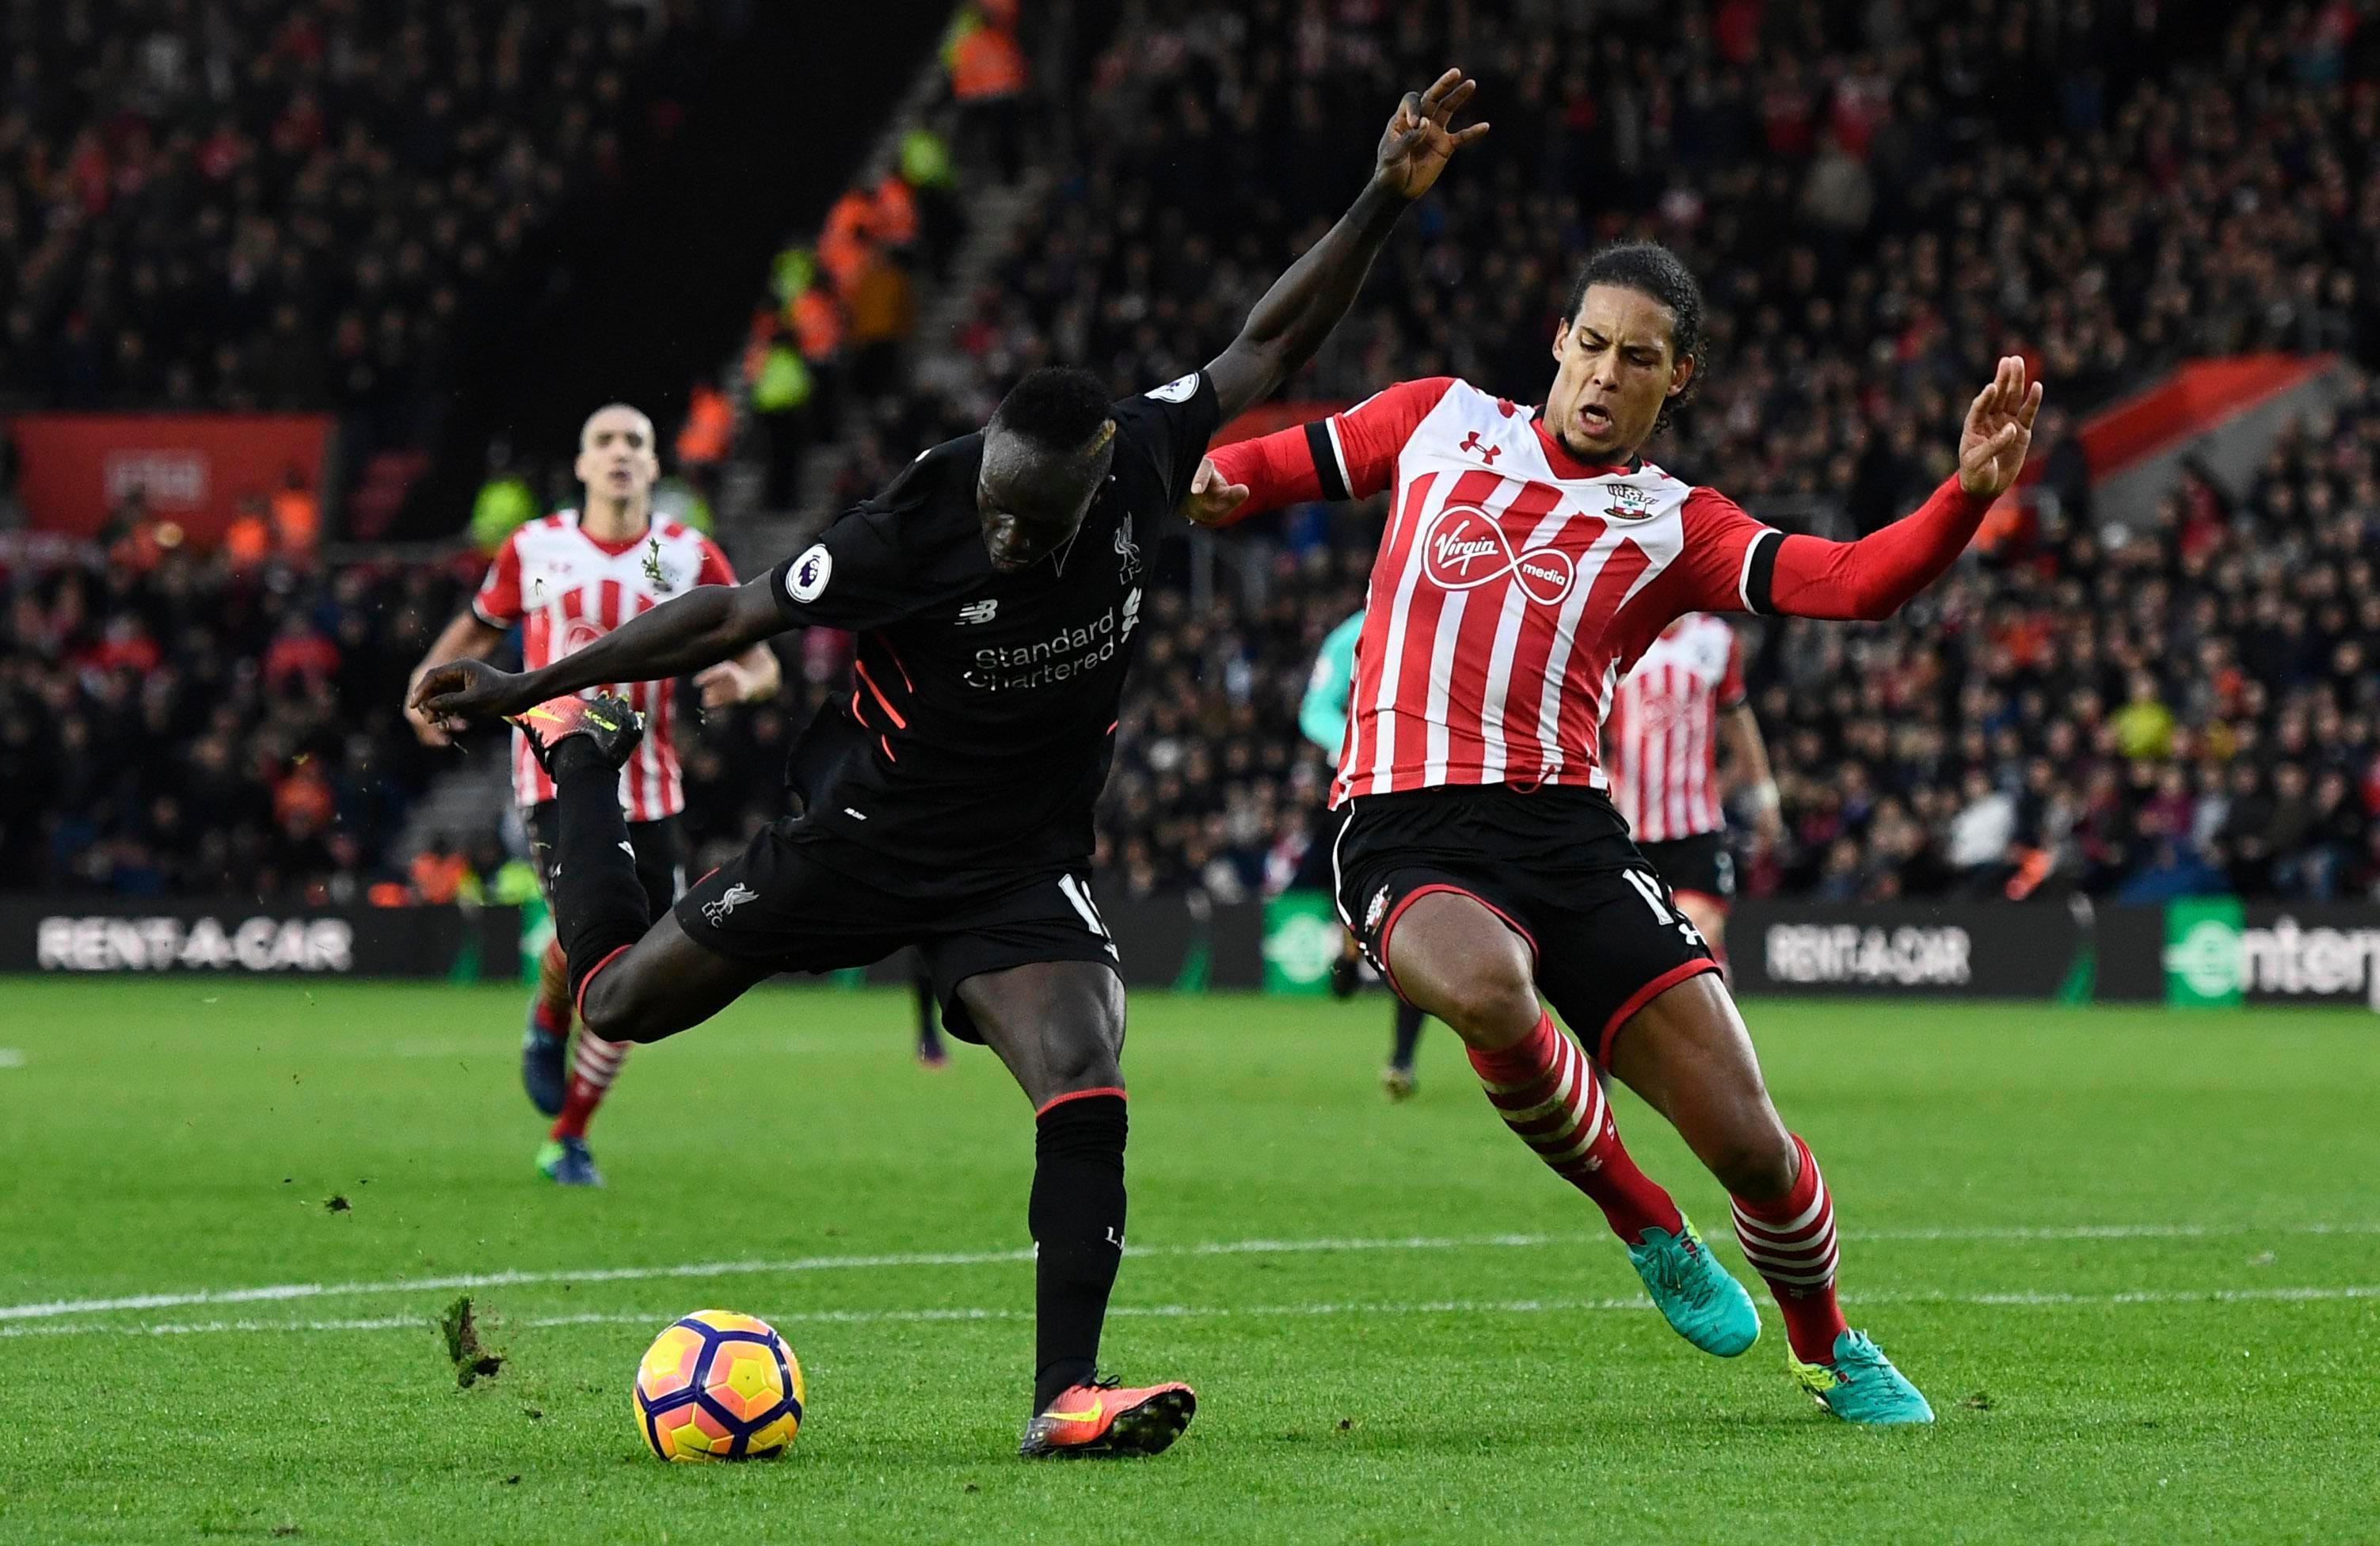 Jurgen Klopp is hoping to land Southampton defender Virgil van Dijk